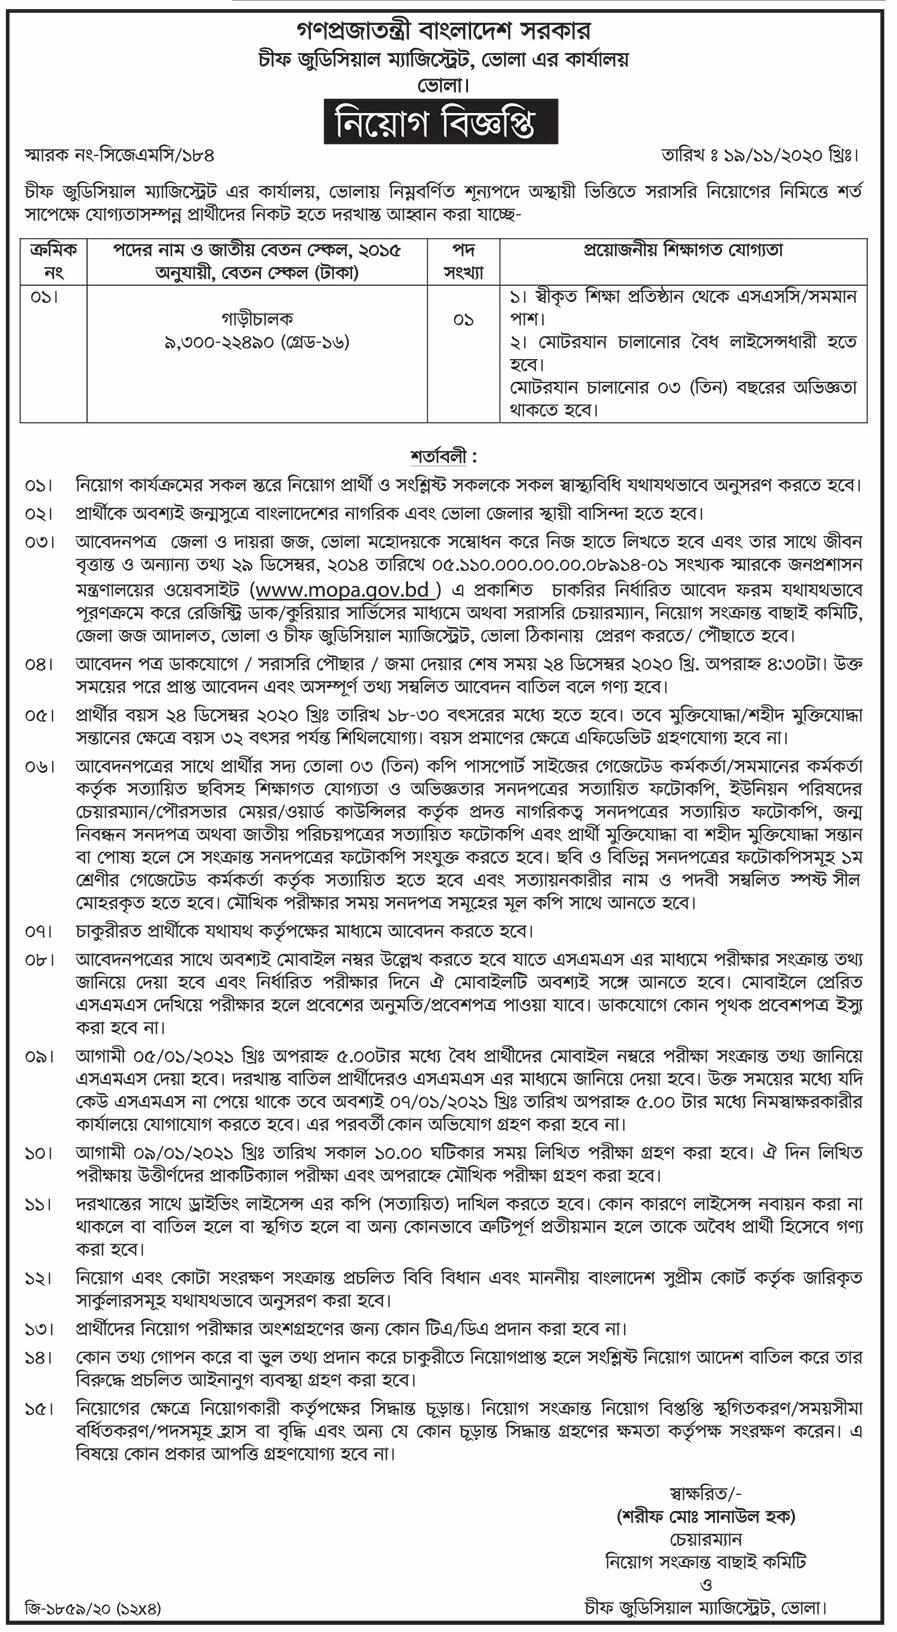 Bhola Chief Judicial Magistrate Office Job Circular 2020